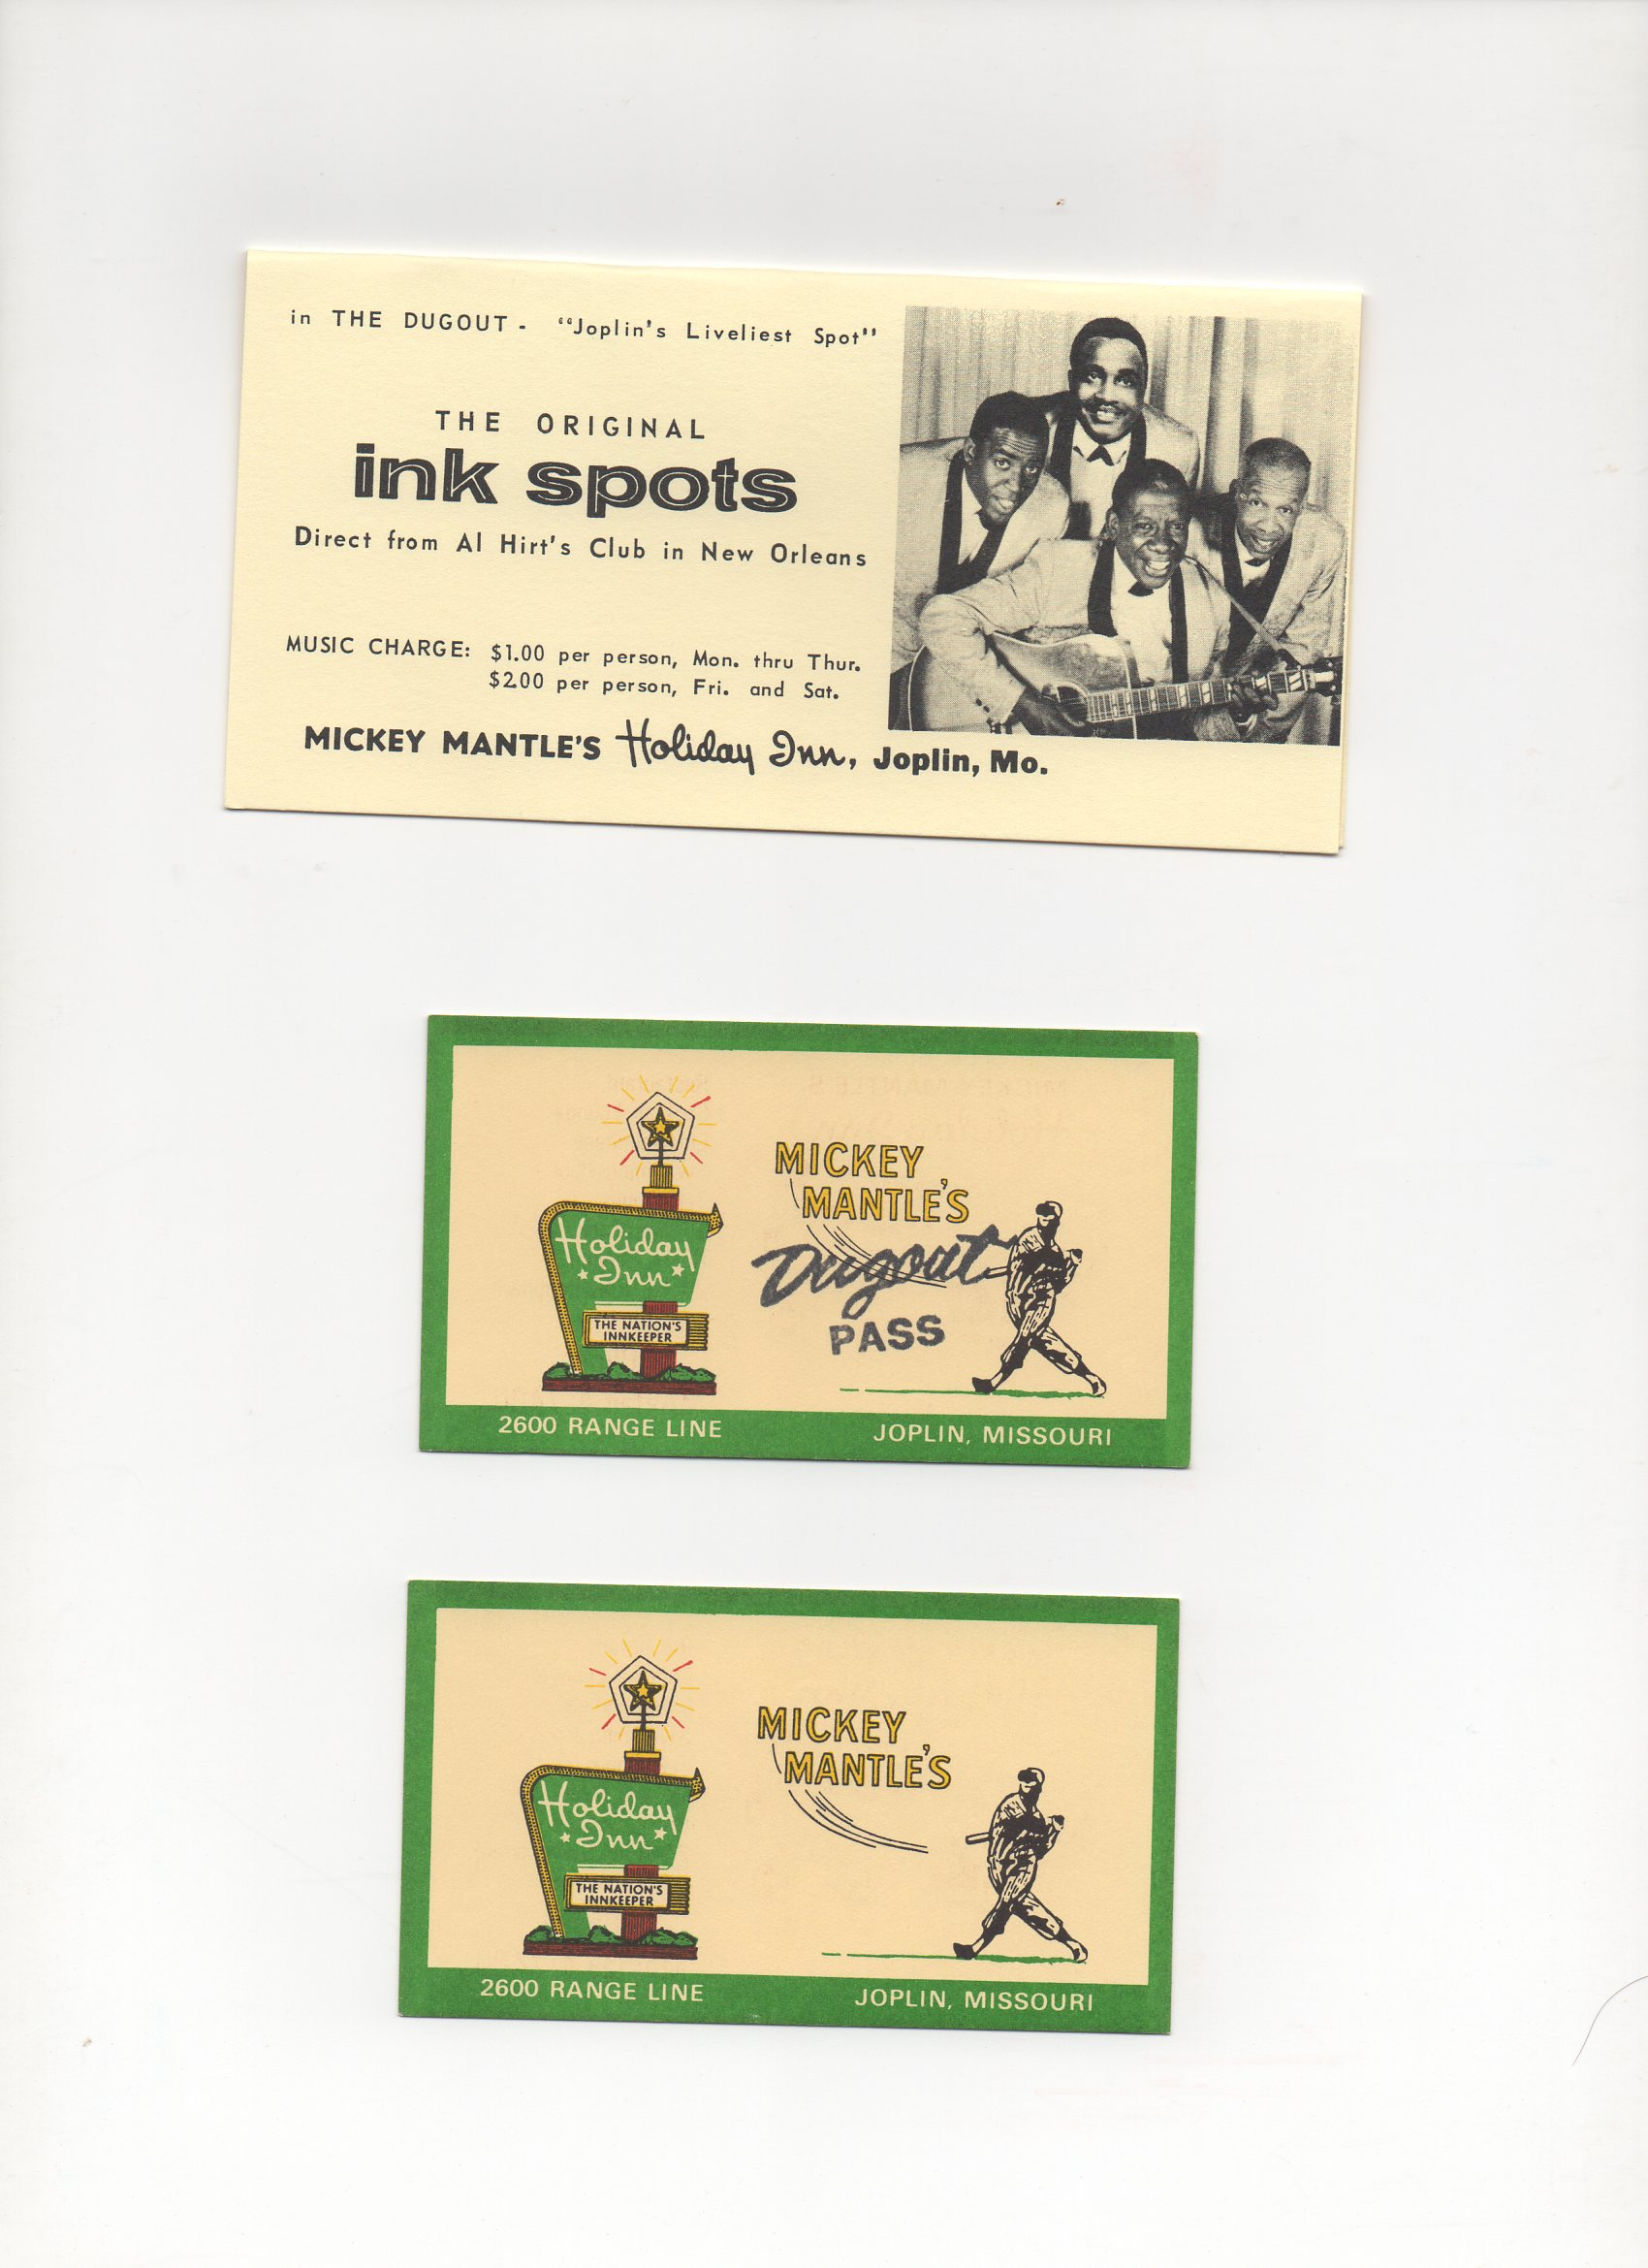 1956-1962 holiday inn